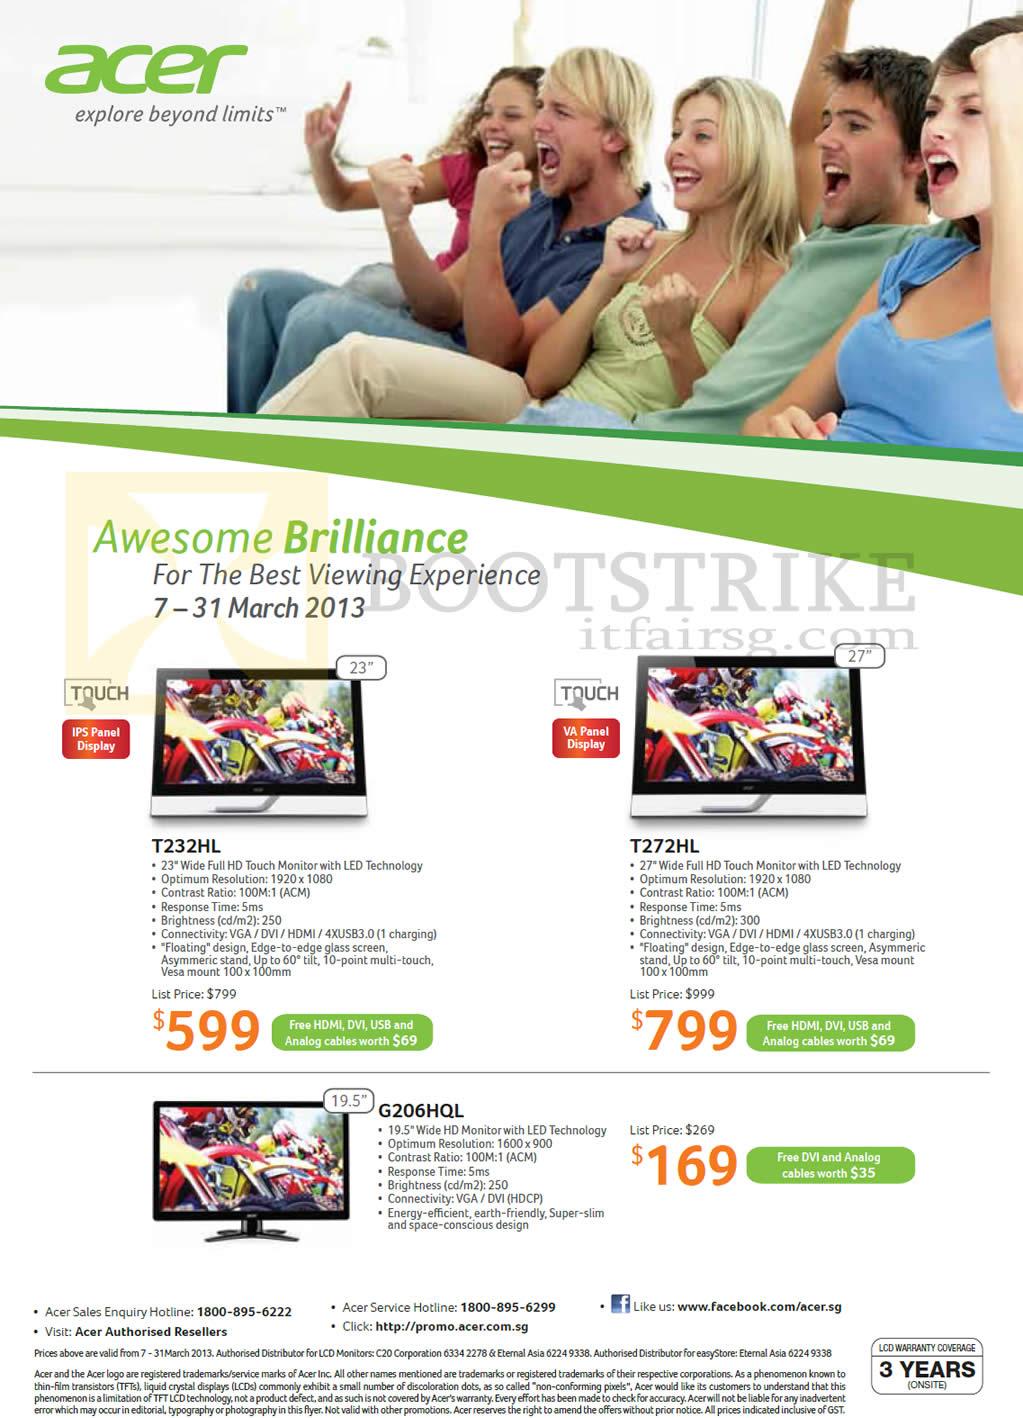 IT SHOW 2013 price list image brochure of Acer Monitors LED T232HL, T272HL, G206HQL